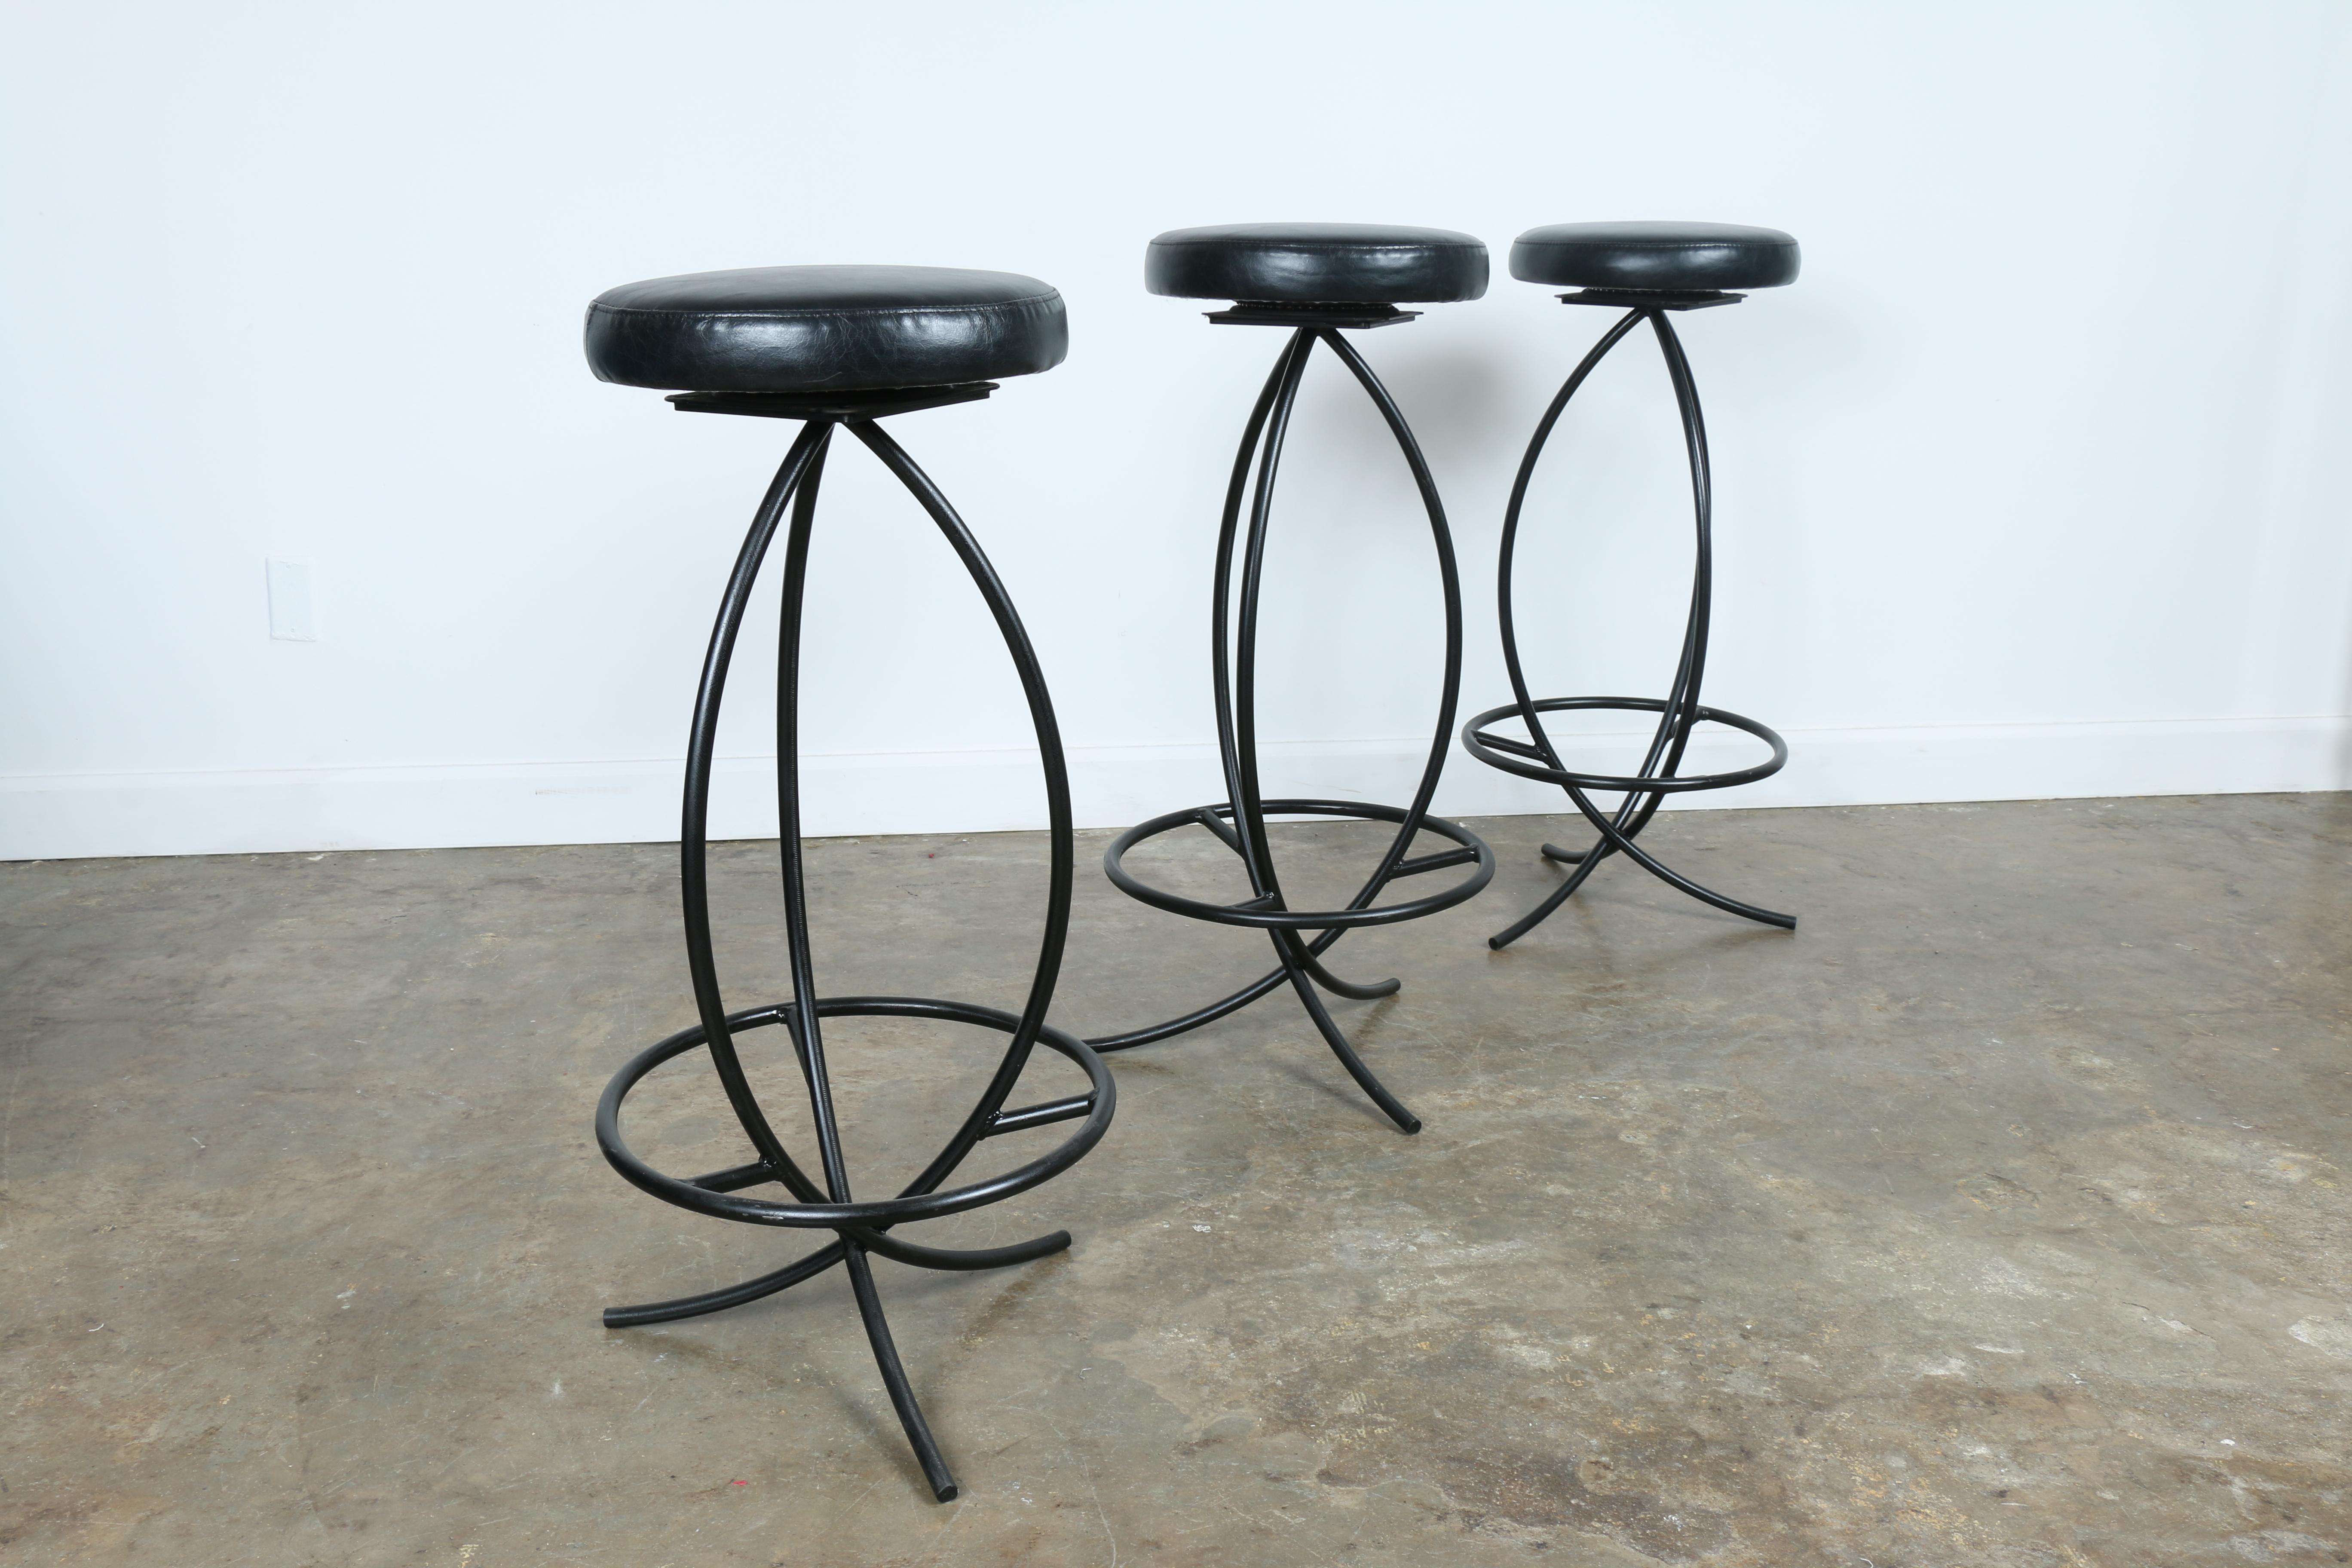 Wrought Iron Leather Seat Bar Stools Set Of 3 Chairish